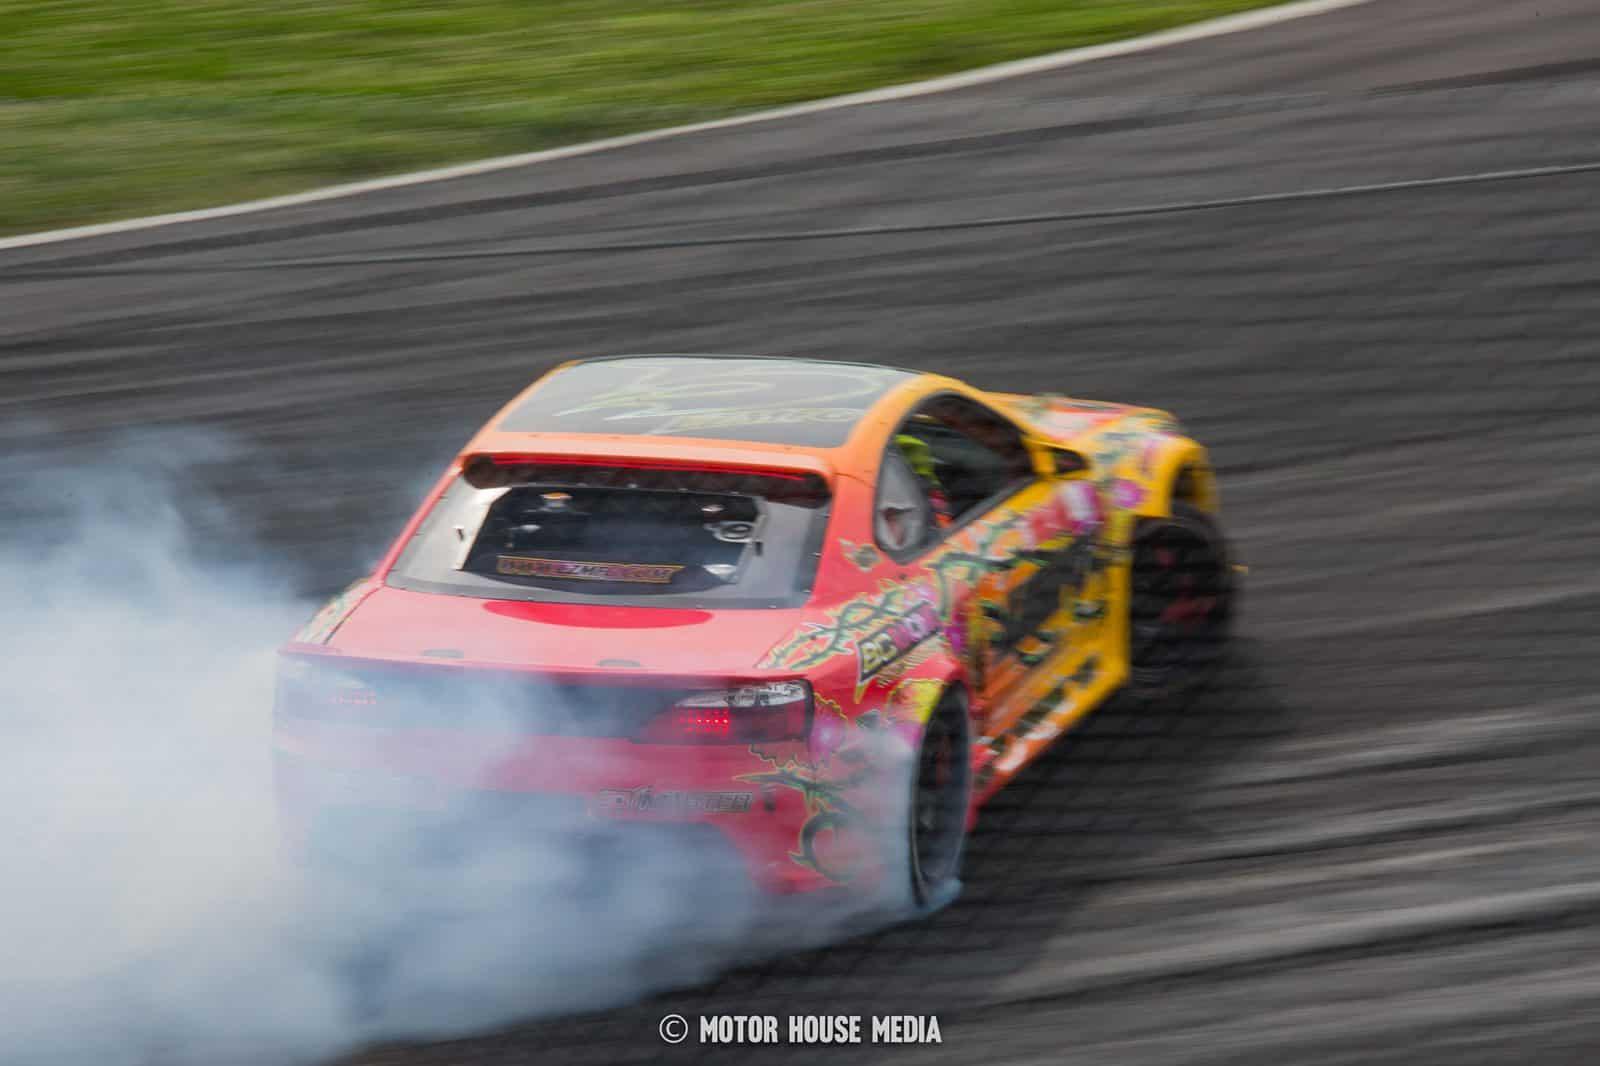 Adam LZ in his LZMFG Formal Drift car